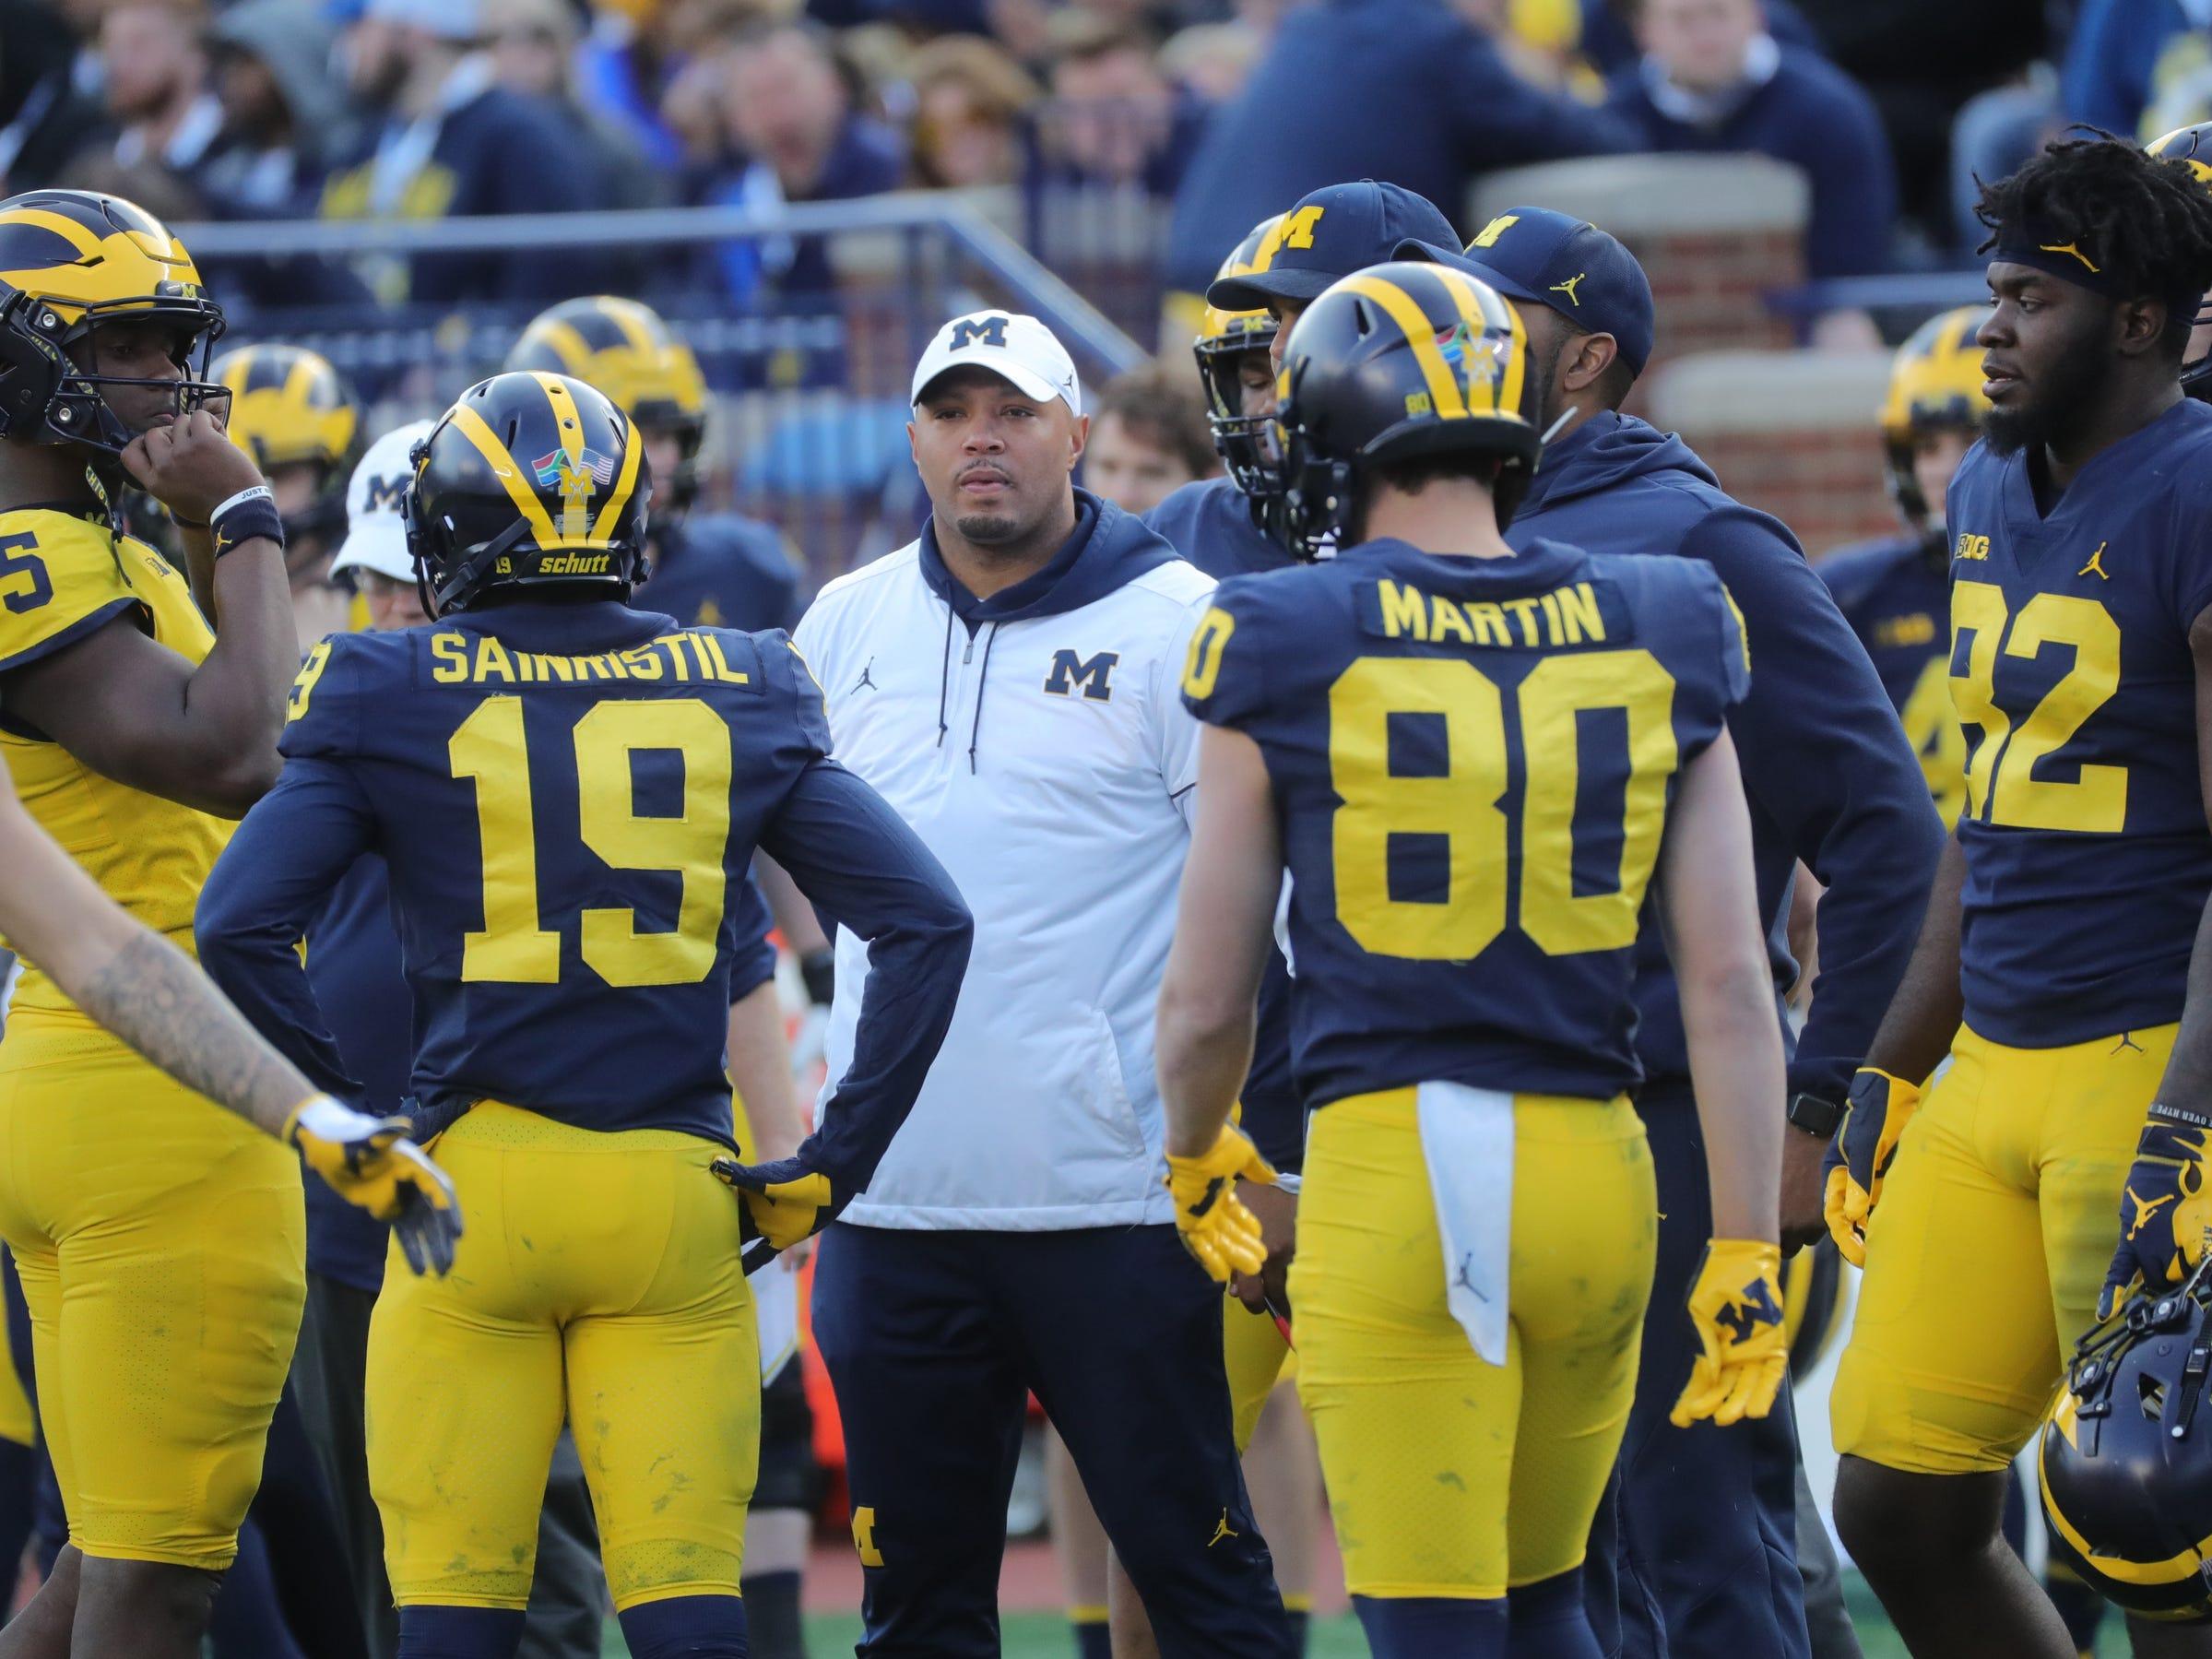 Michigan offensives coordinator Josh Gattis talks to the players during the spring game Saturday, April 13, 2019 at Michigan Stadium in Ann Arbor.